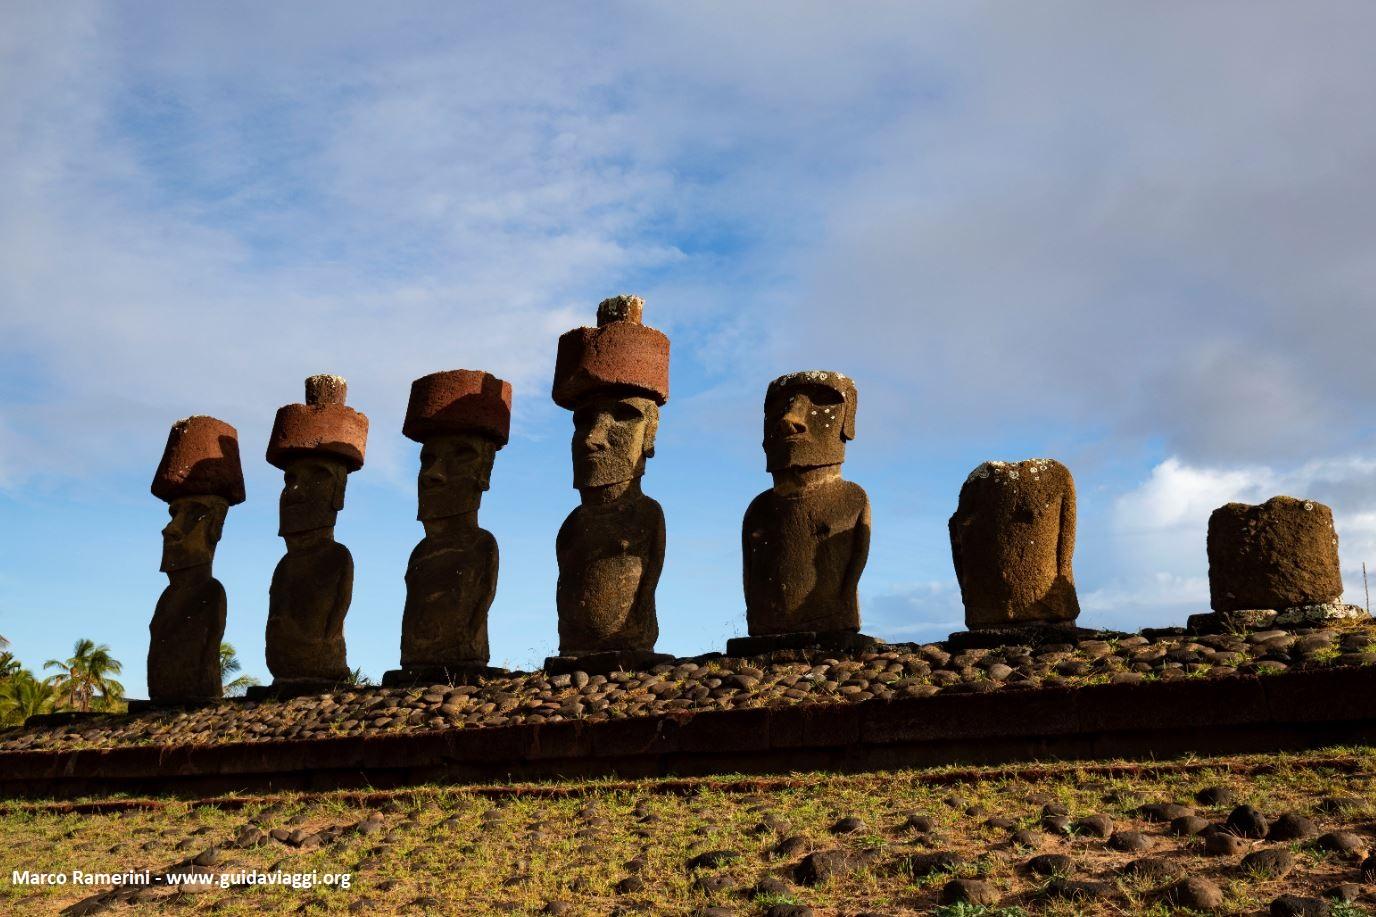 Ahu Nau Nau, Anakena, Île de Pâques, Chili. Auteur et Copyright Marco Ramerini